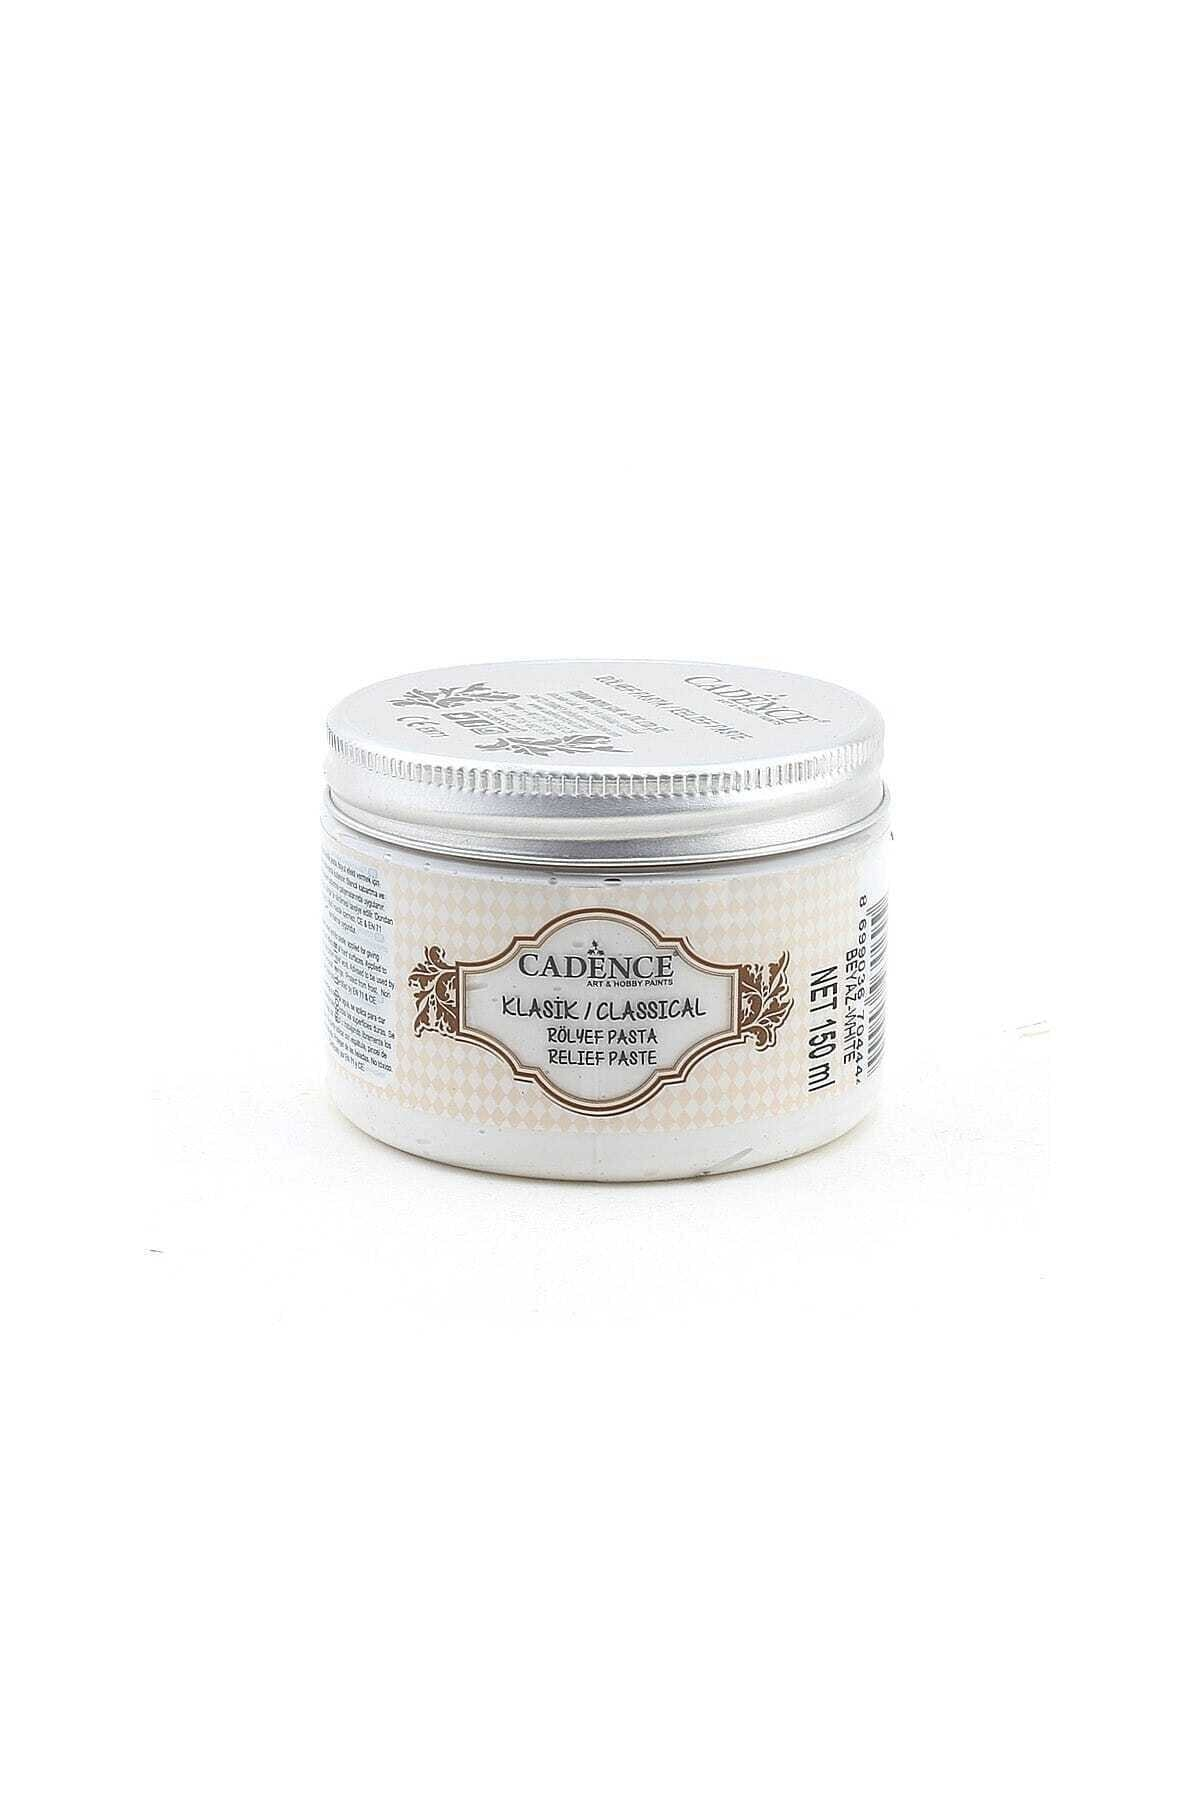 Cadence Rölyef Pasta 150 ml. (250 gr.) 2